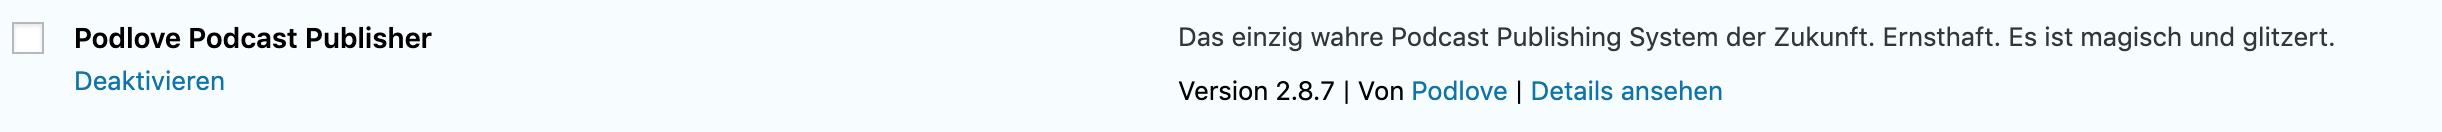 20190624-dcbks